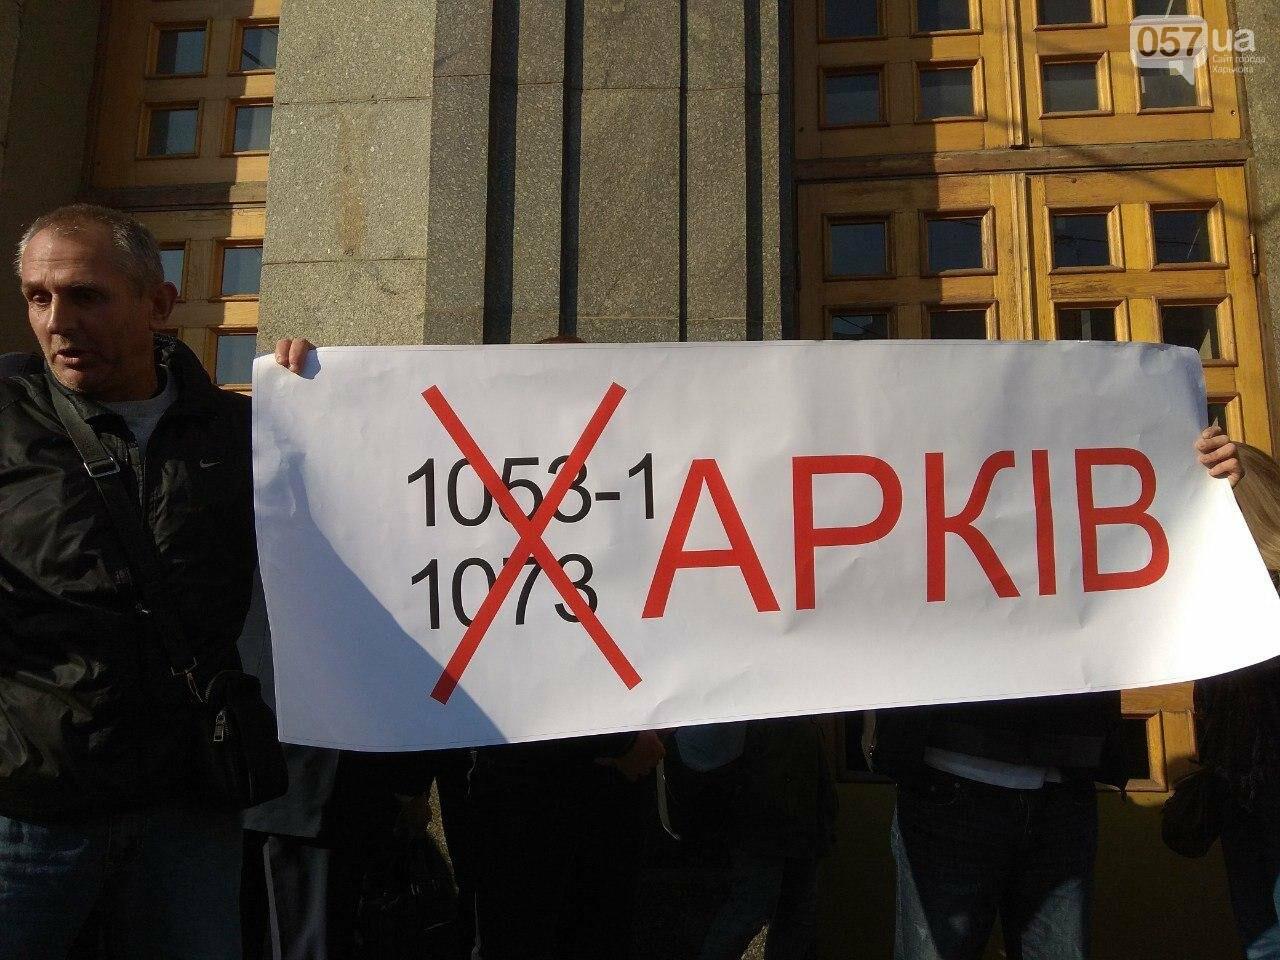 «Нам дорога не нужна»: предприниматели «Барабашово» пикетируют горсовет, - ФОТО, фото-10